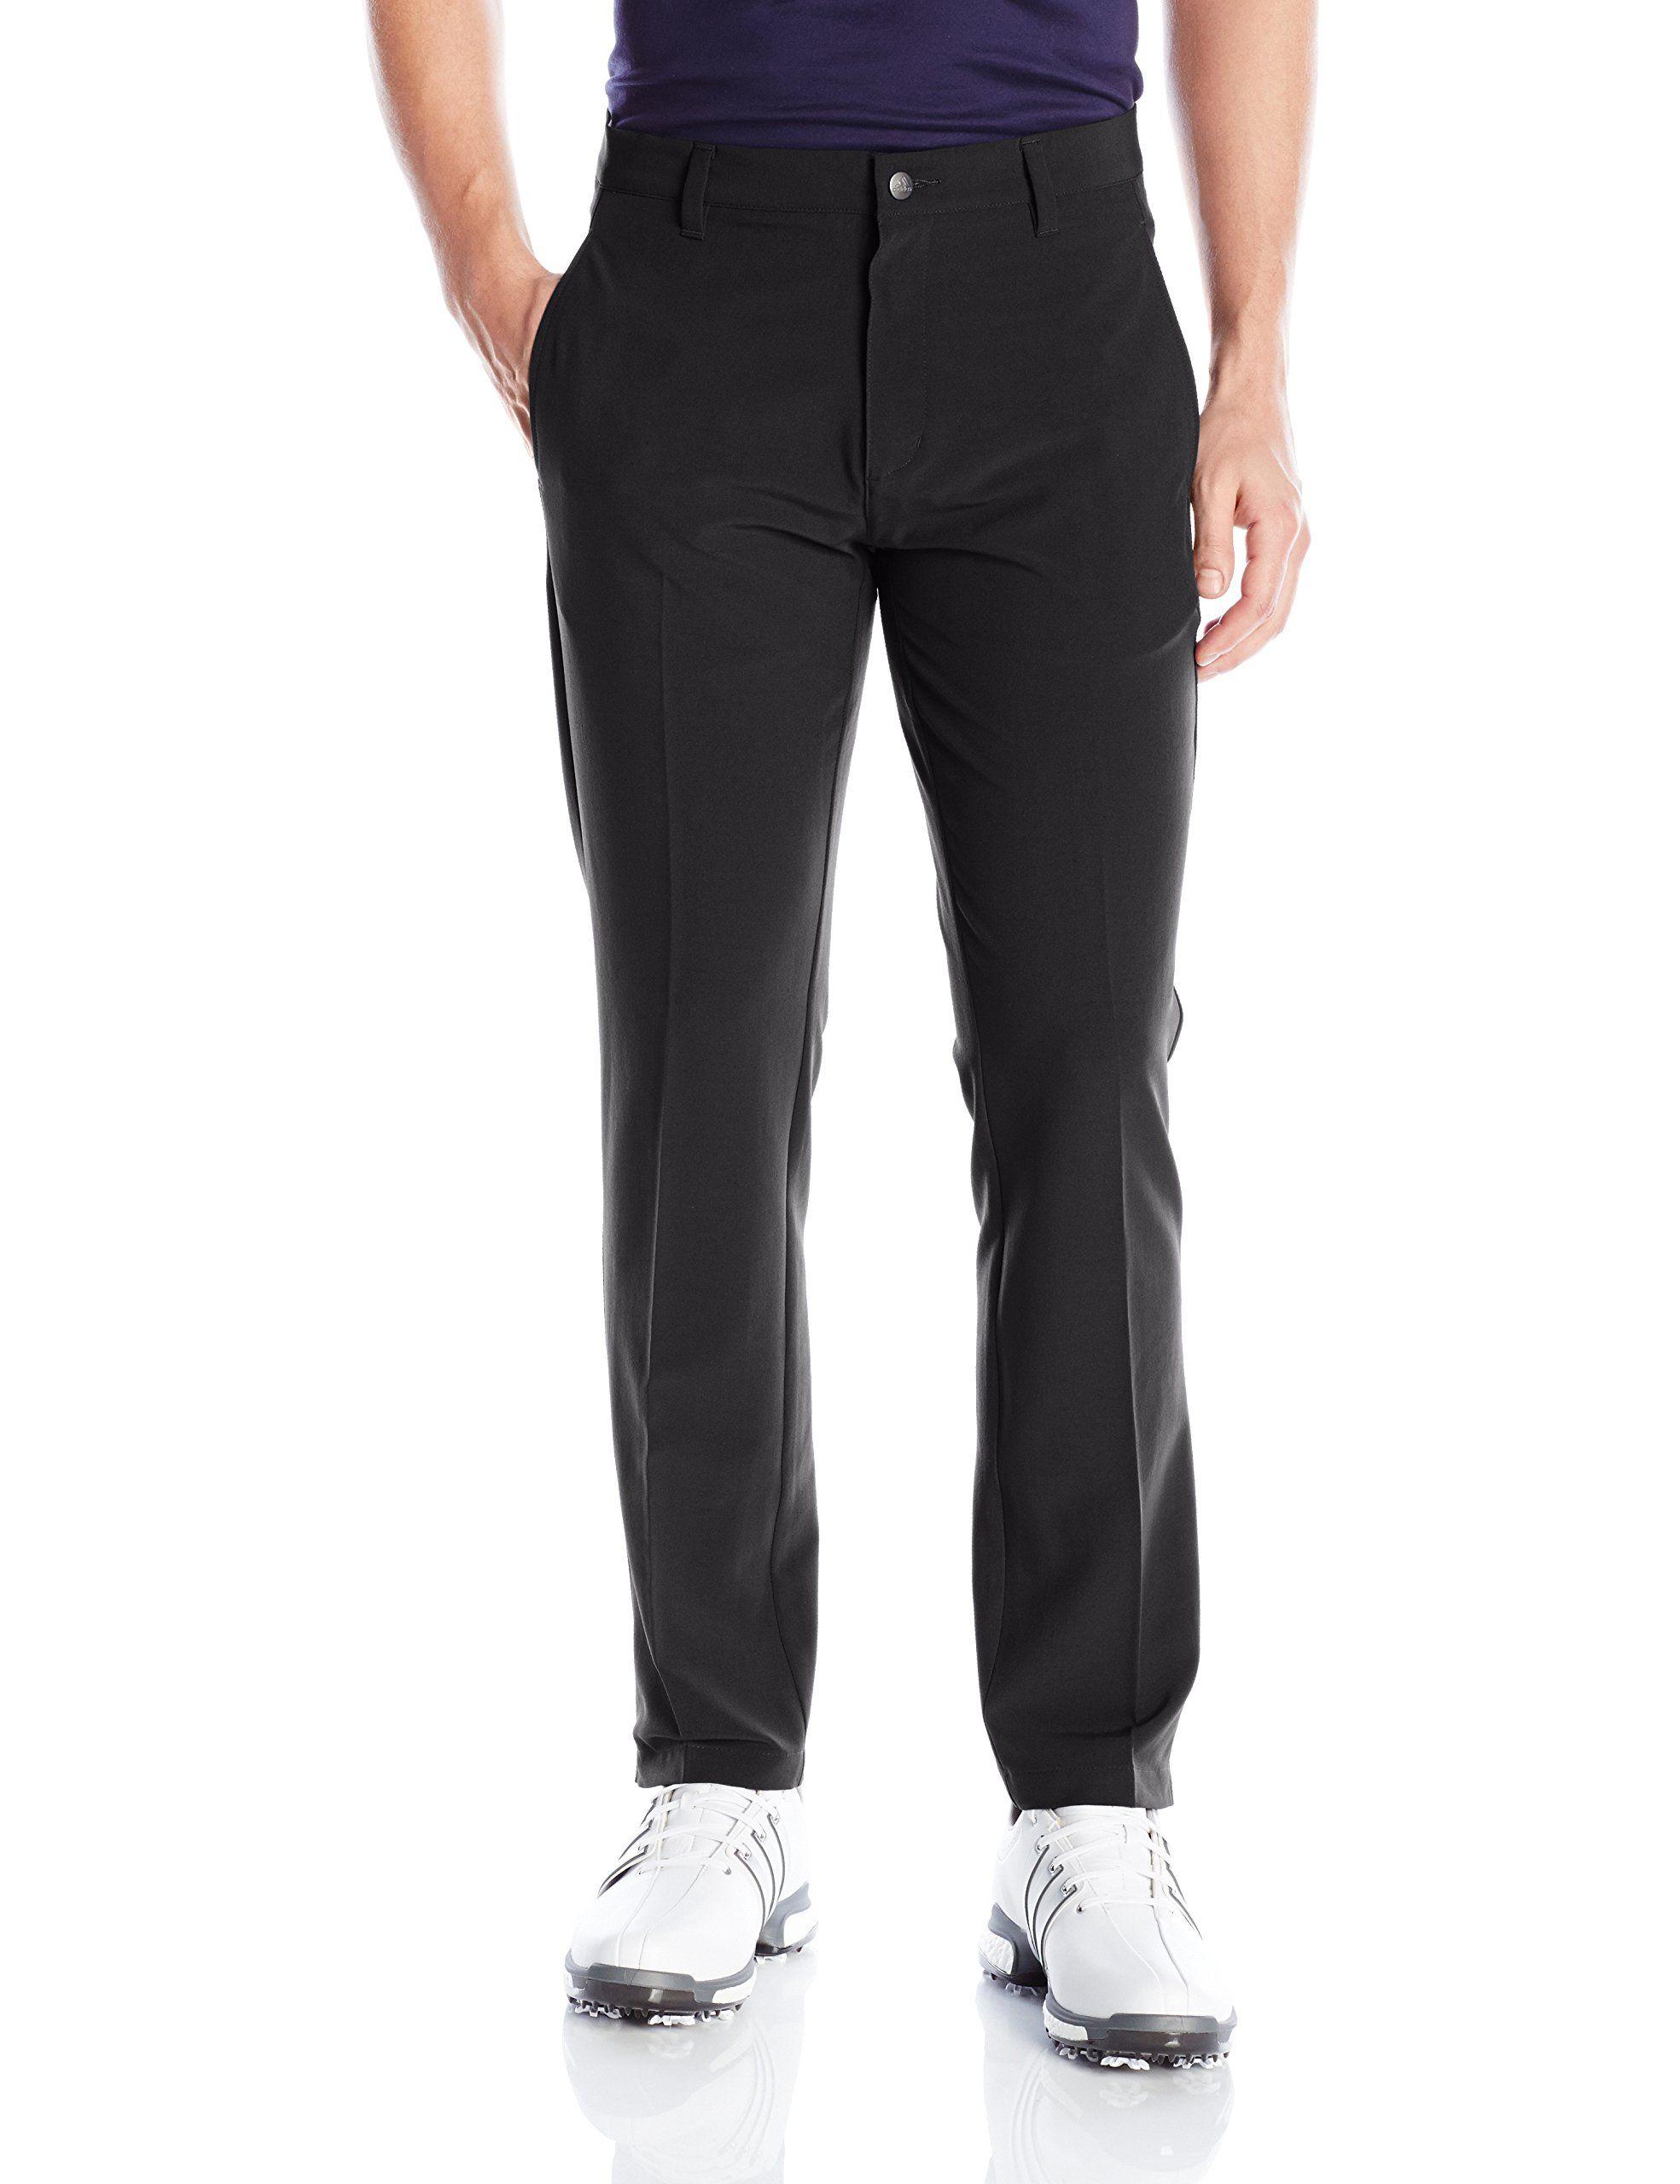 27+ Adidas golf mens adi ultimate 3 stripe shorts info